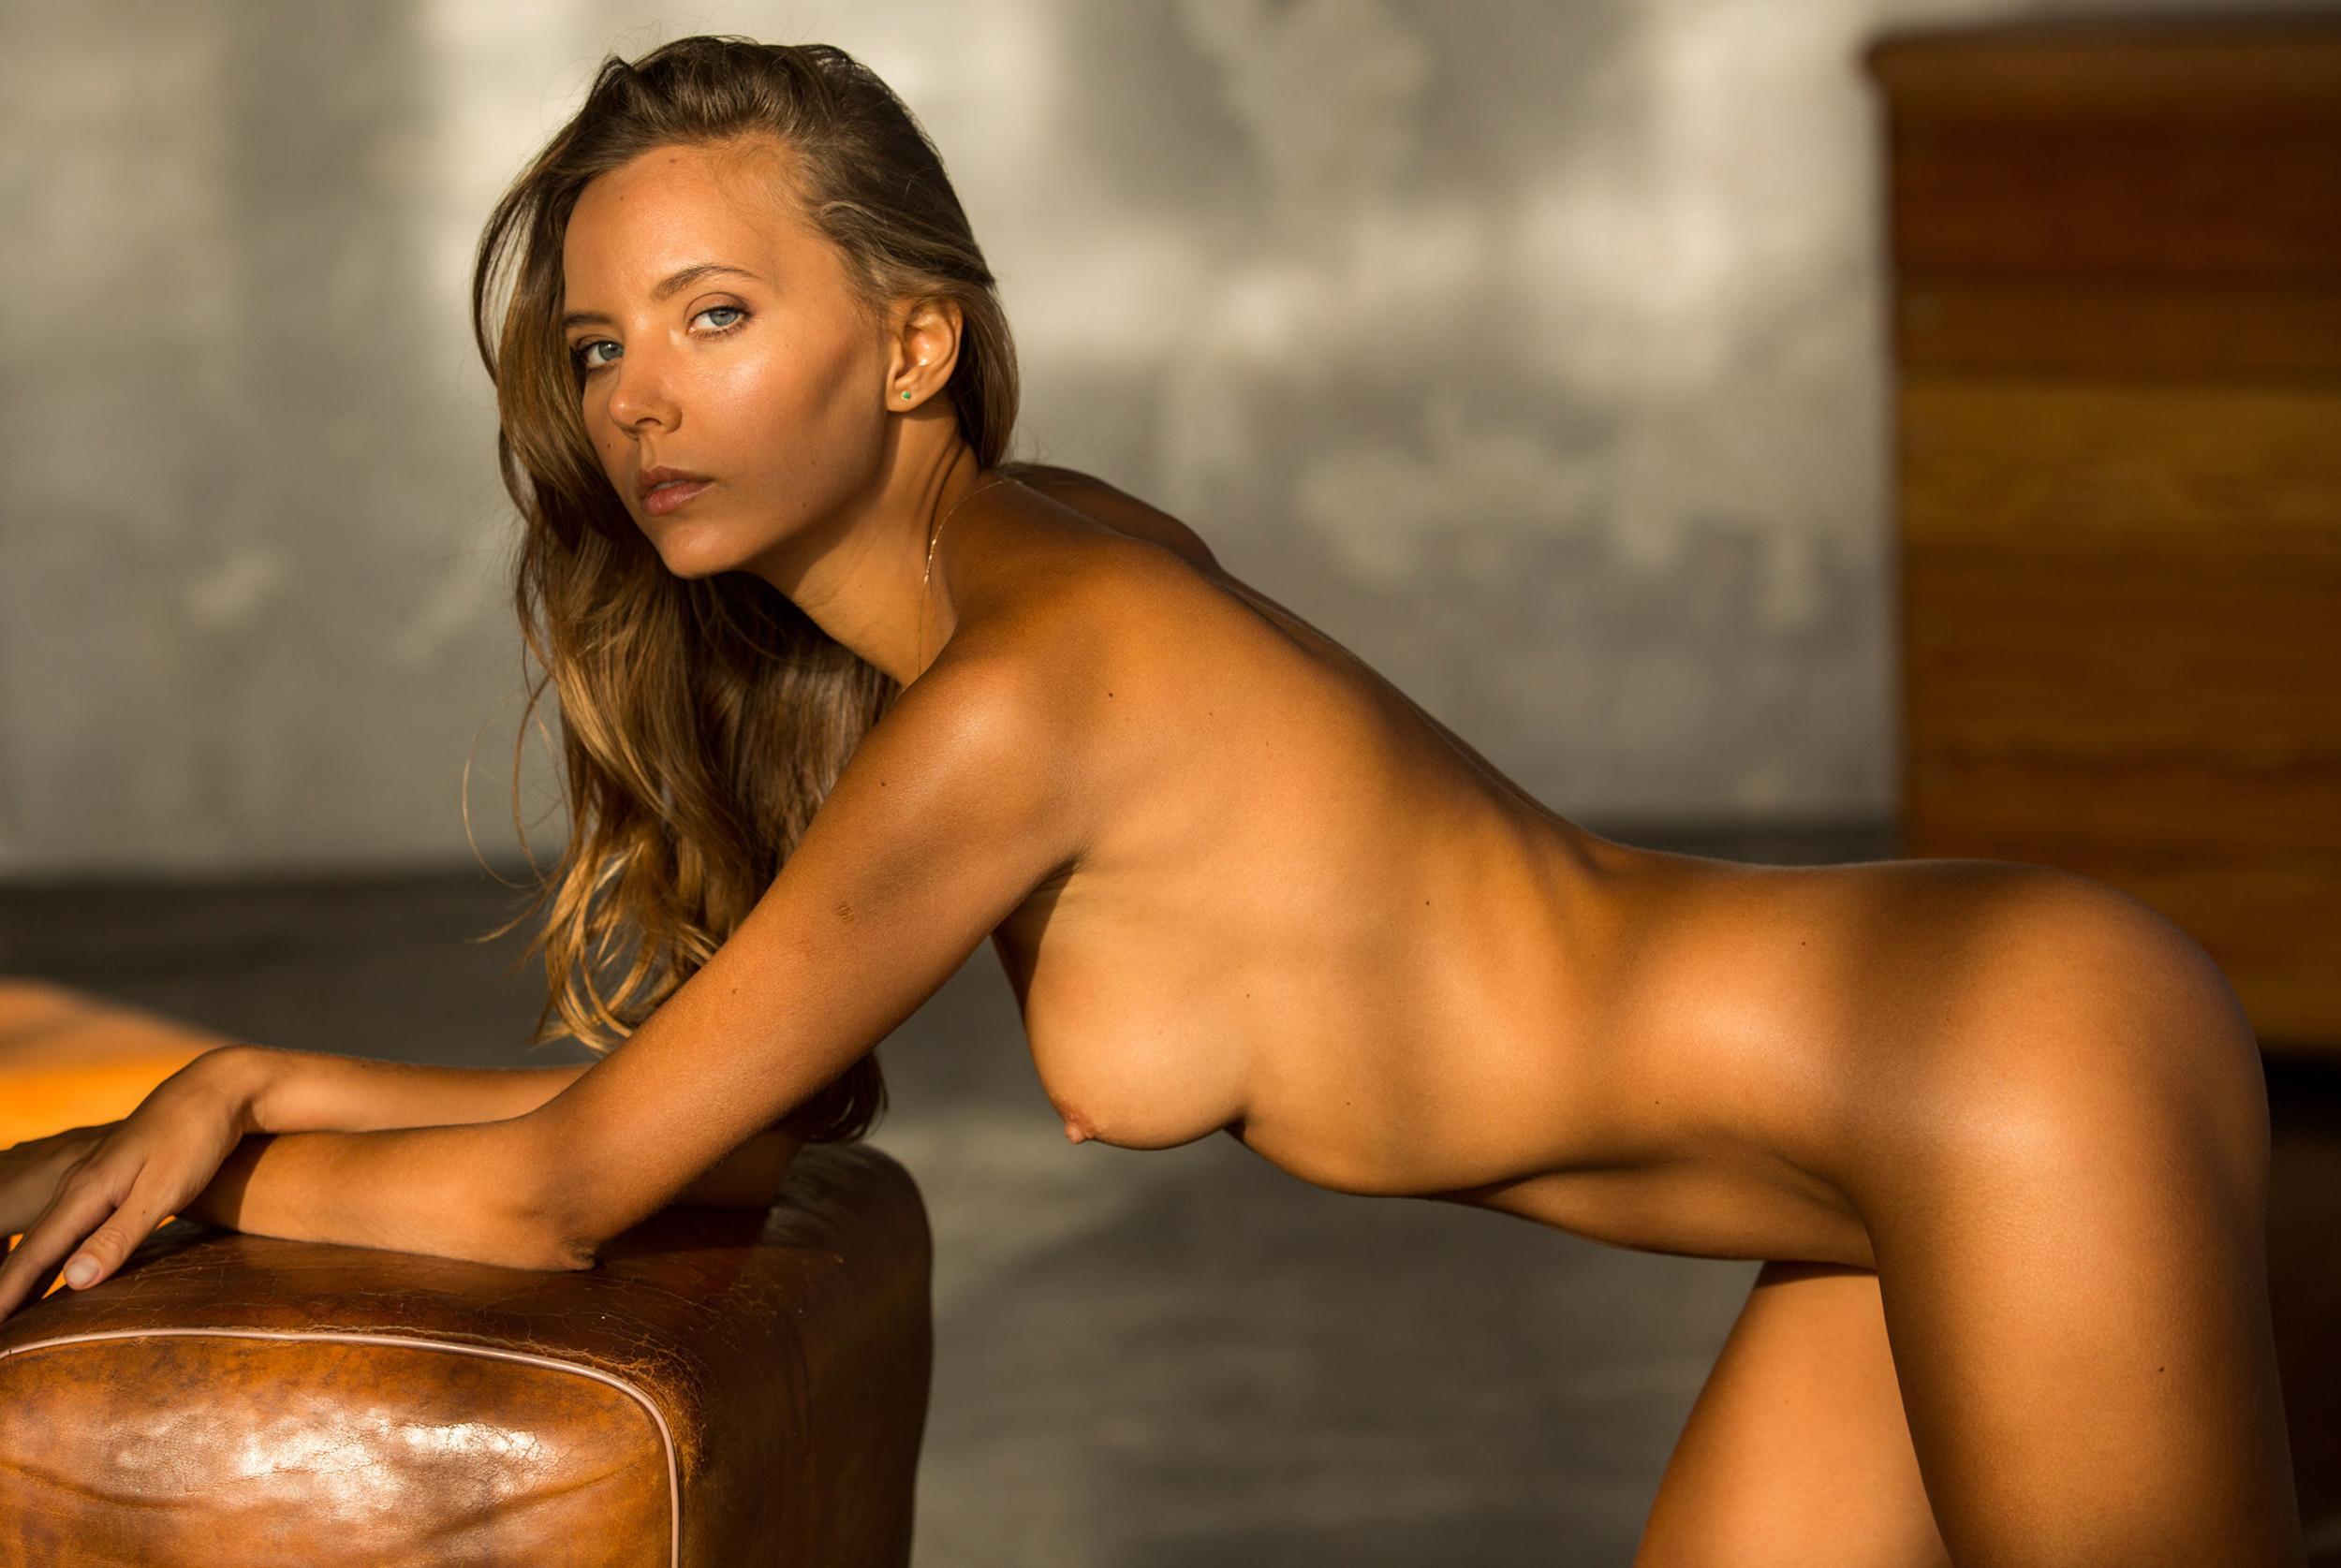 Katya Clover - Hannes Walendy photoshoot